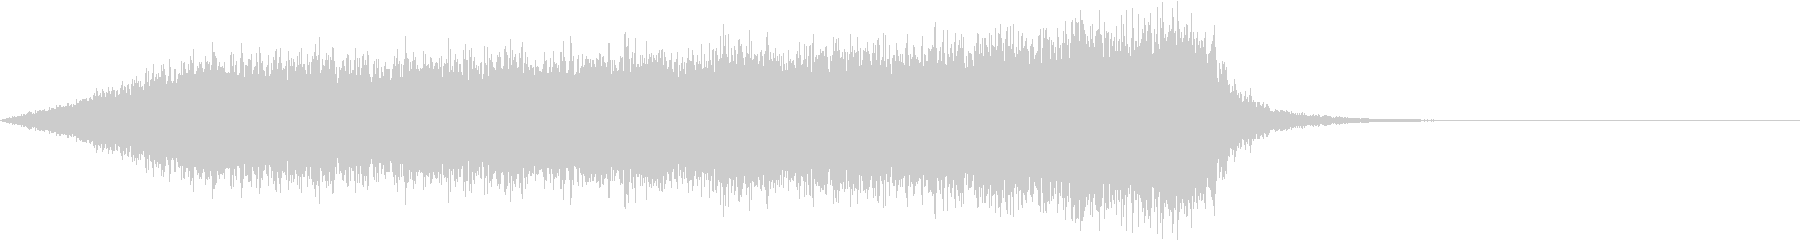 CINEMATIC RISER_43の未再生の波形